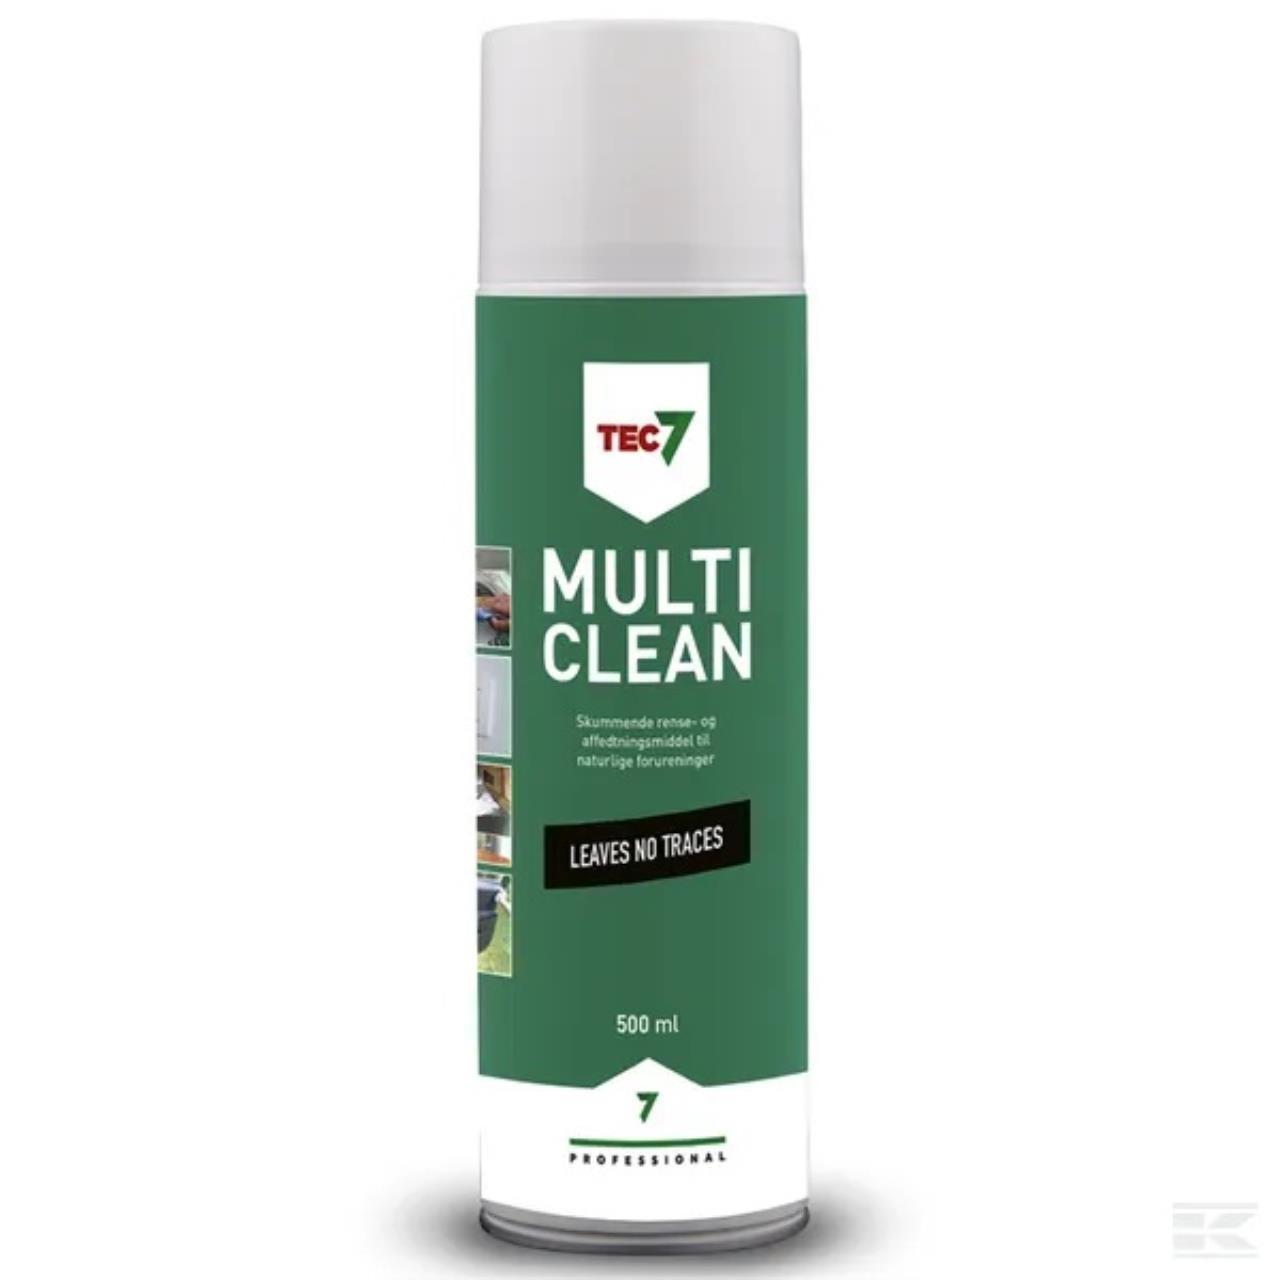 Tec7 Multicleaner Rensemiddel 500 ml (Foam7)